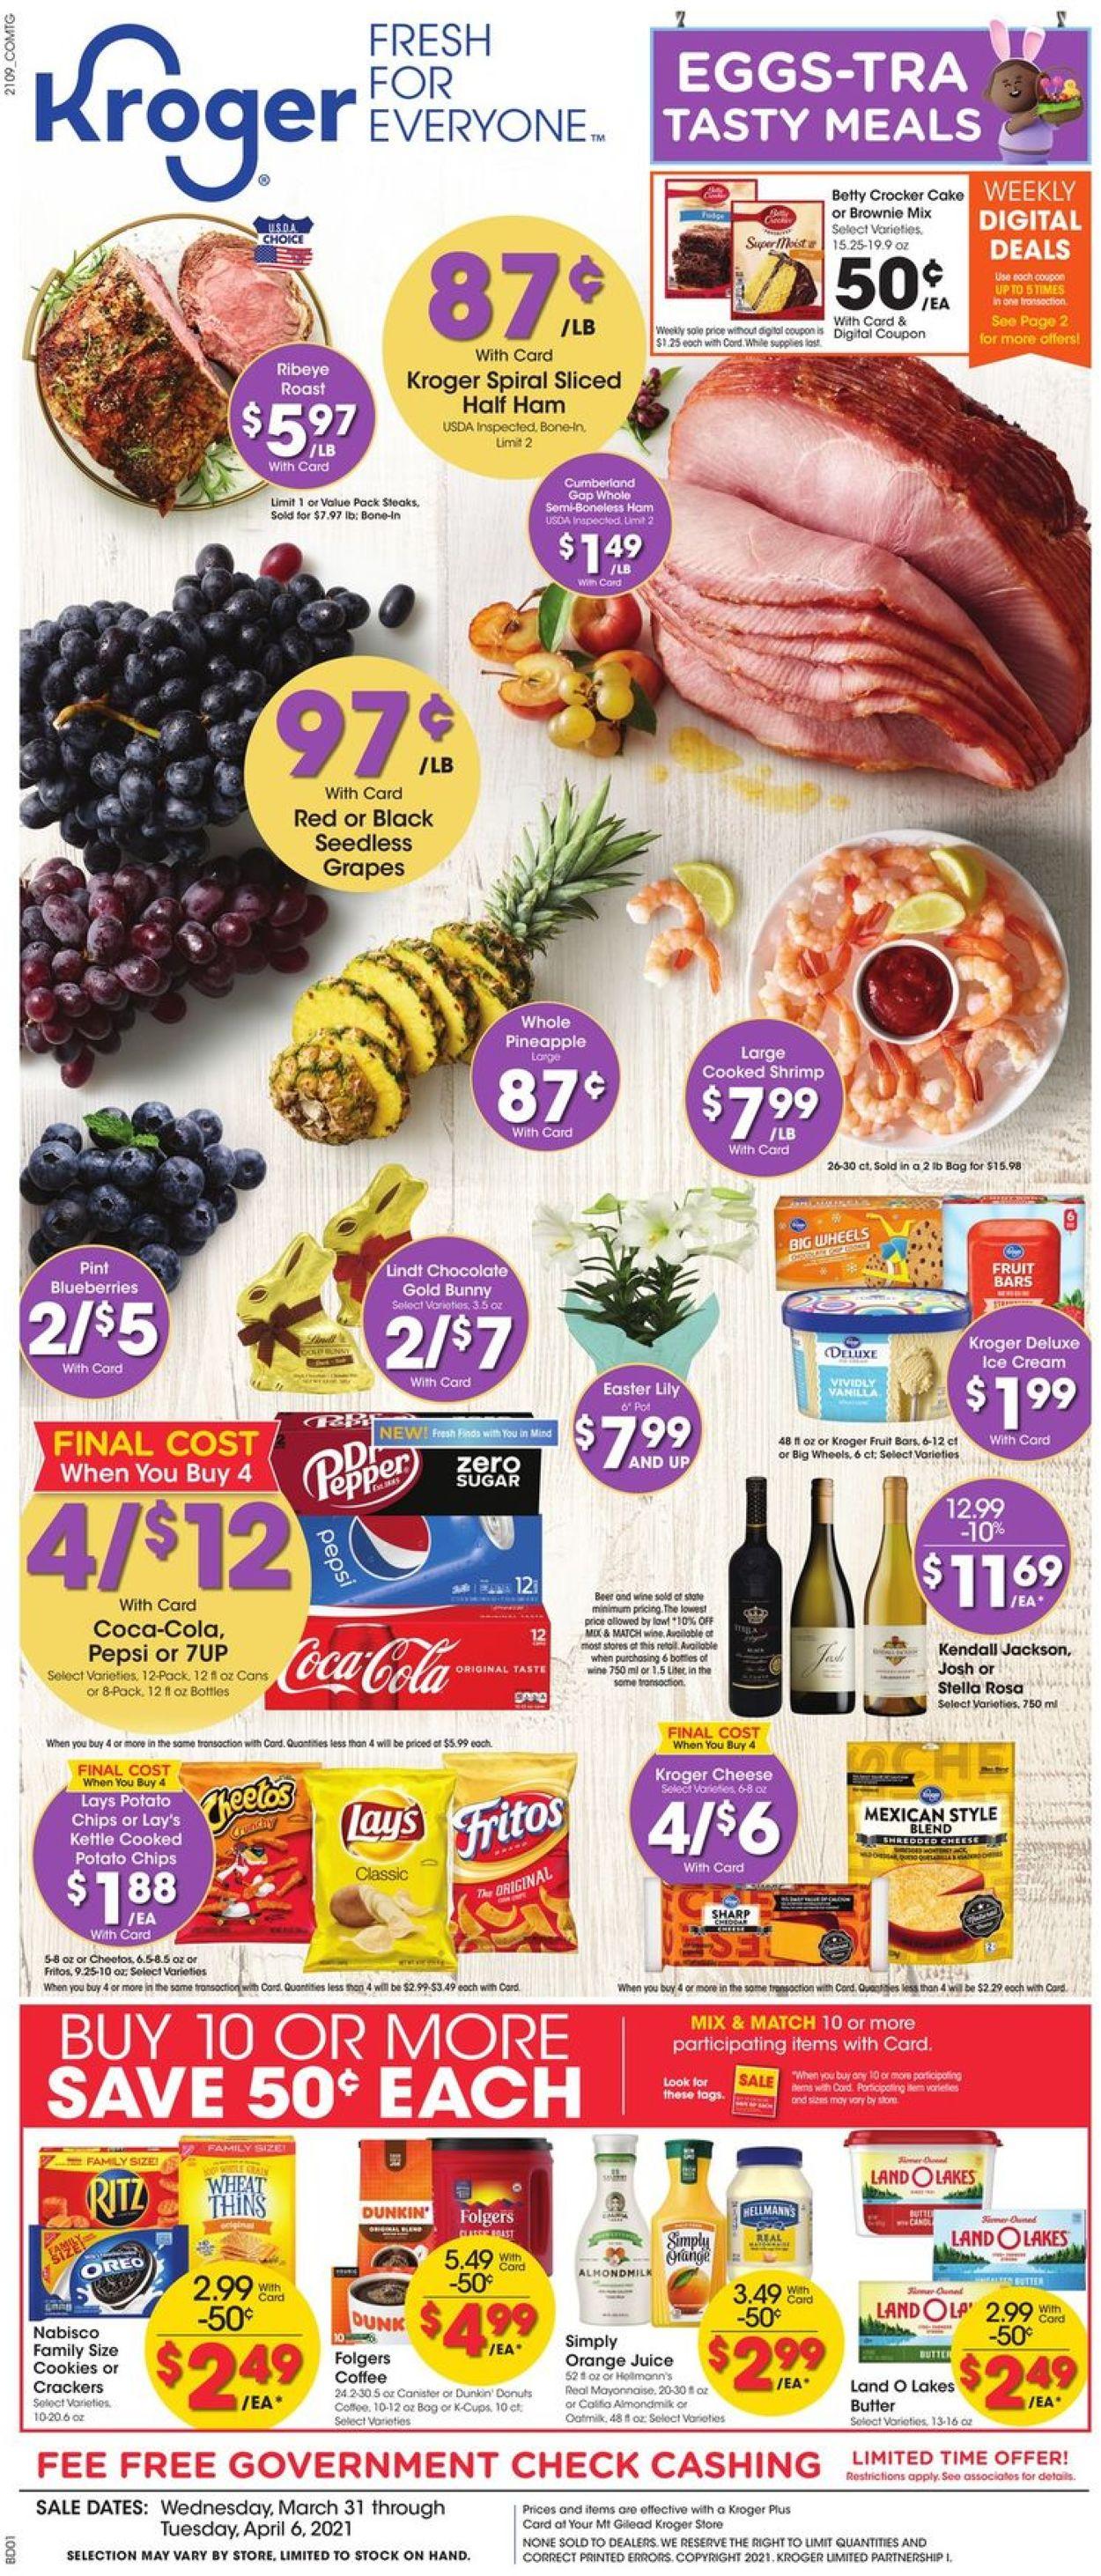 Kroger - Easter 2021 Ad Weekly Ad Circular - valid 03/31-04/06/2021